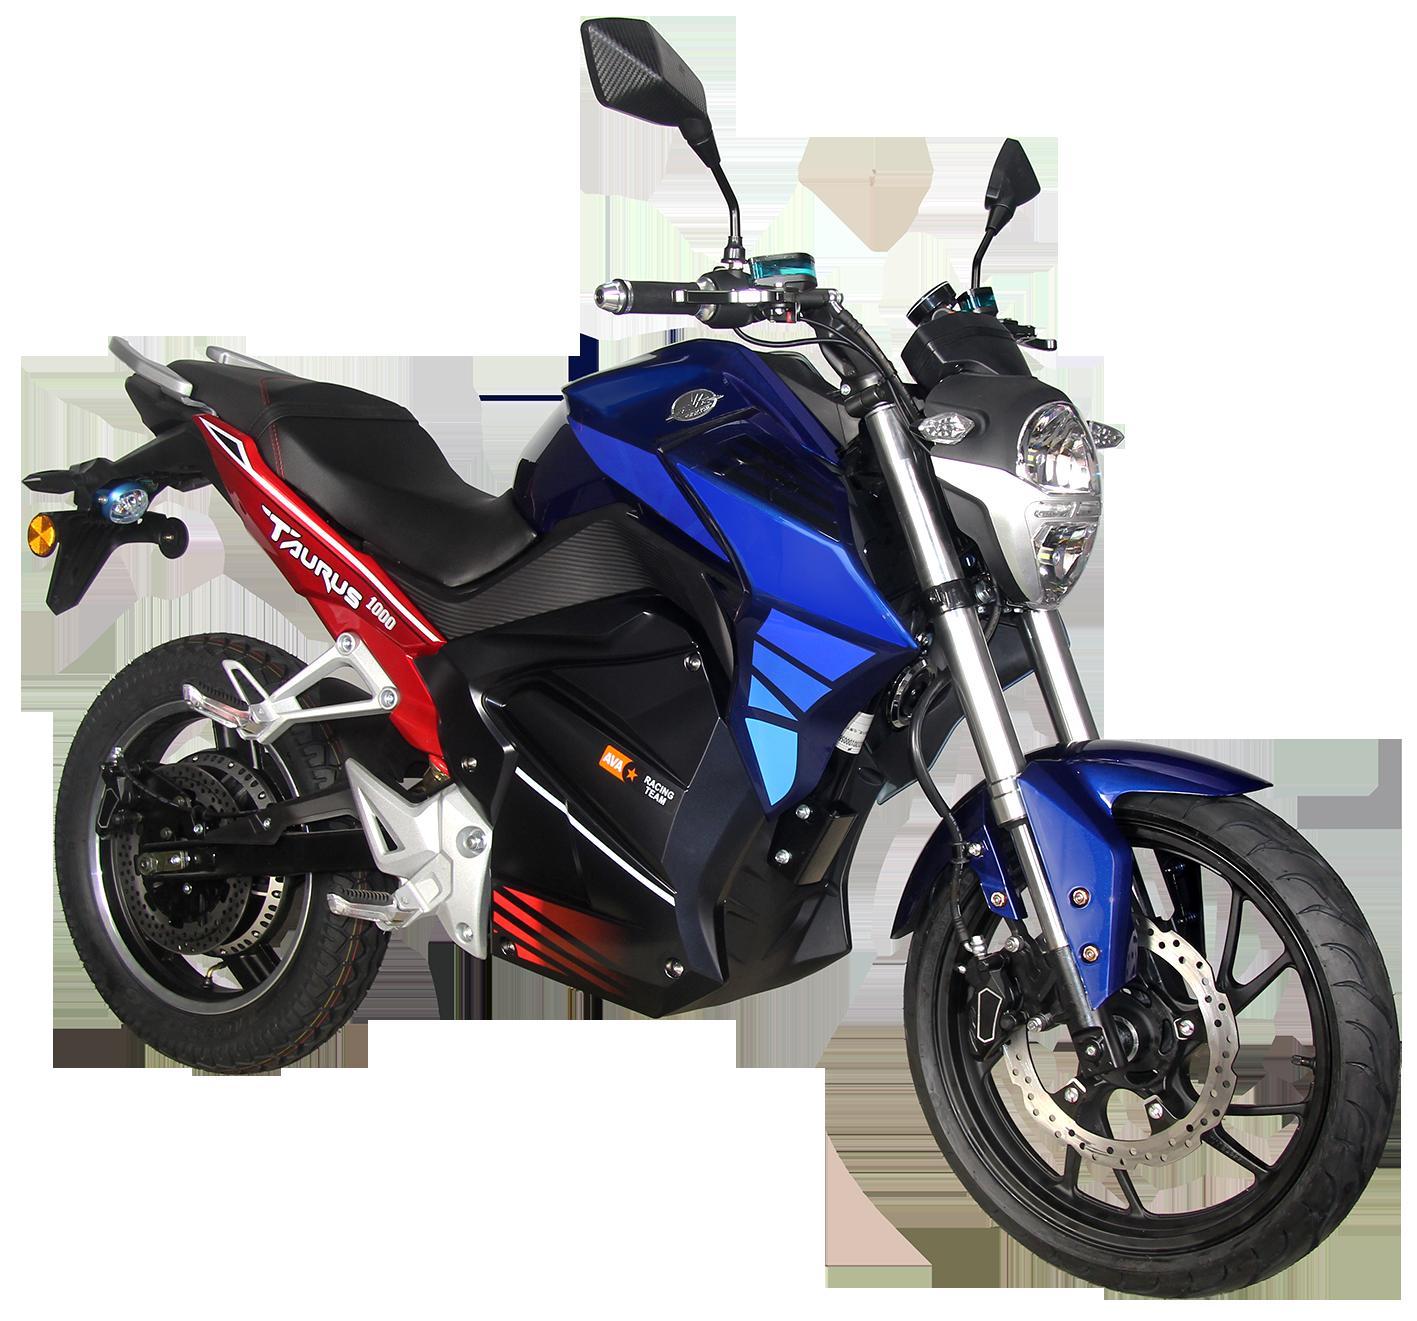 Zappy E-motorcycle